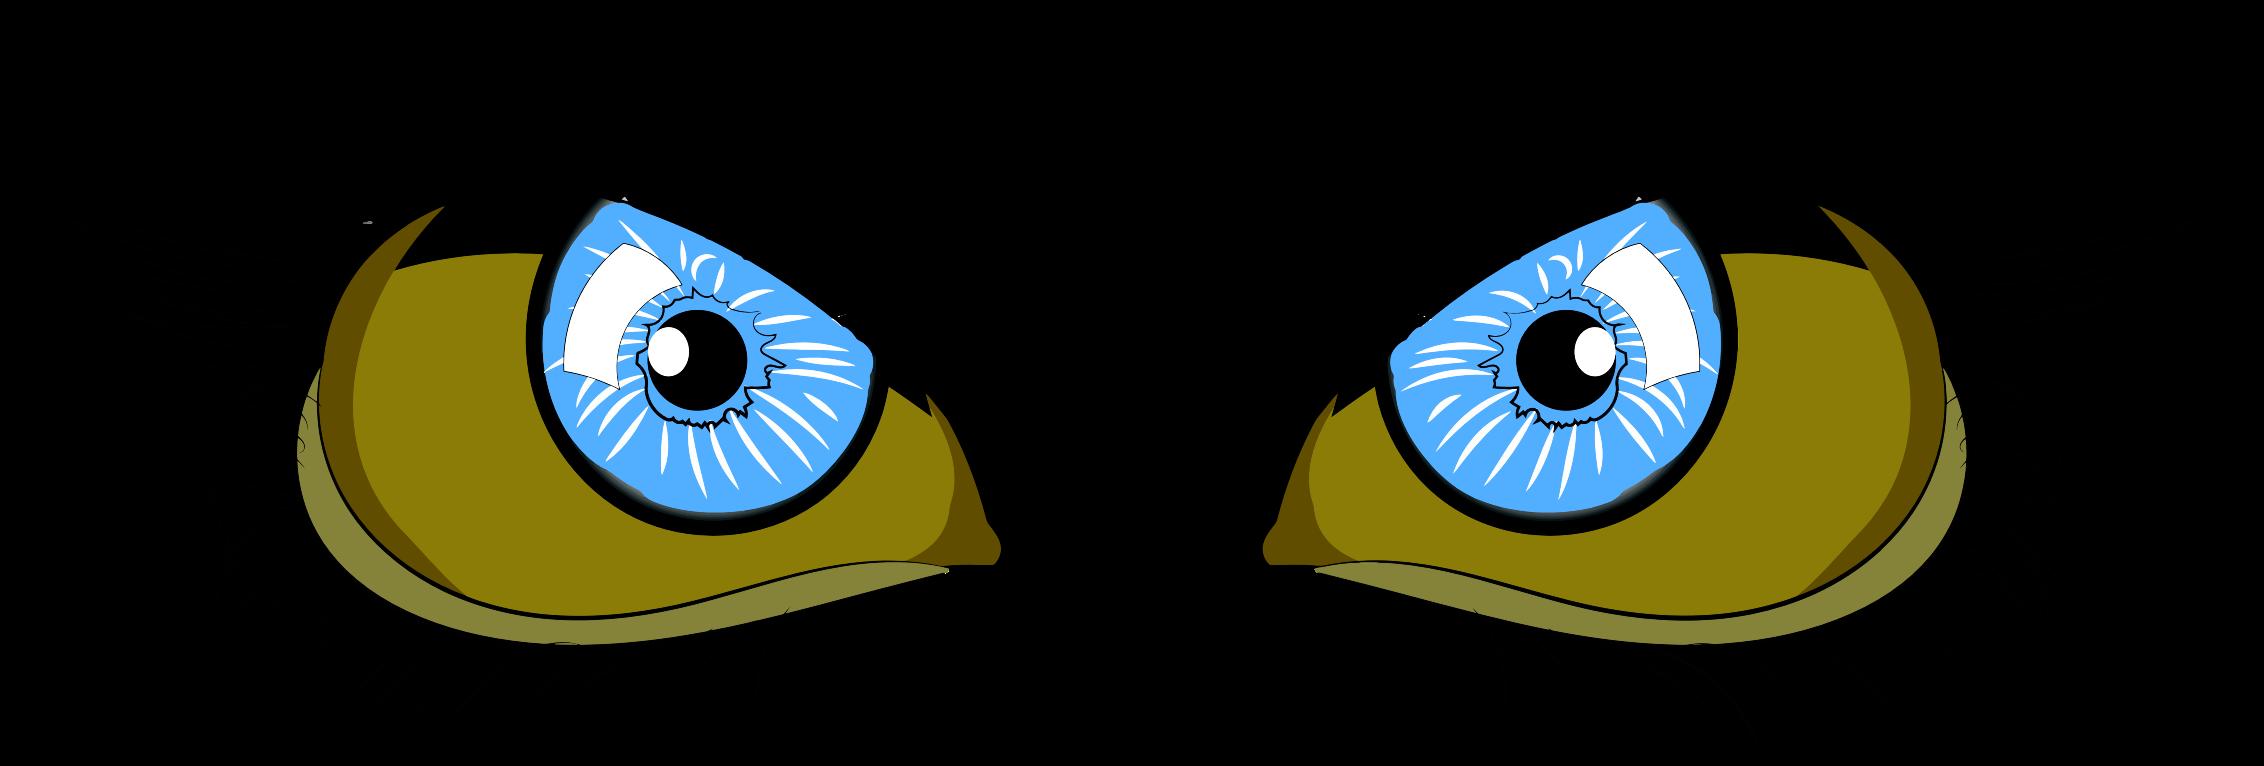 Eyelash clipart cartoon character. Blue eyes icons png